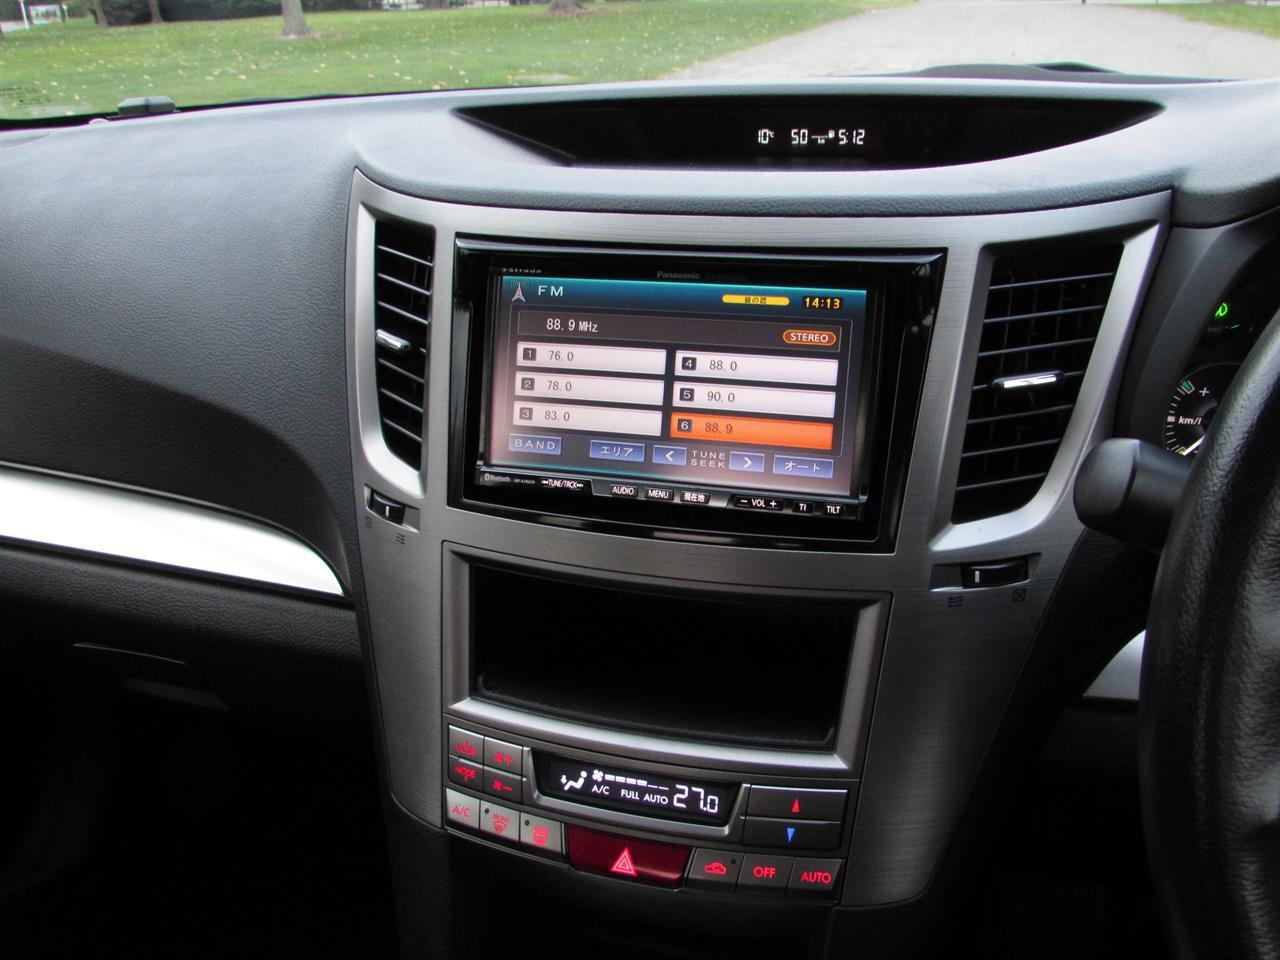 2011 Subaru LEGACY | only $53 weekly